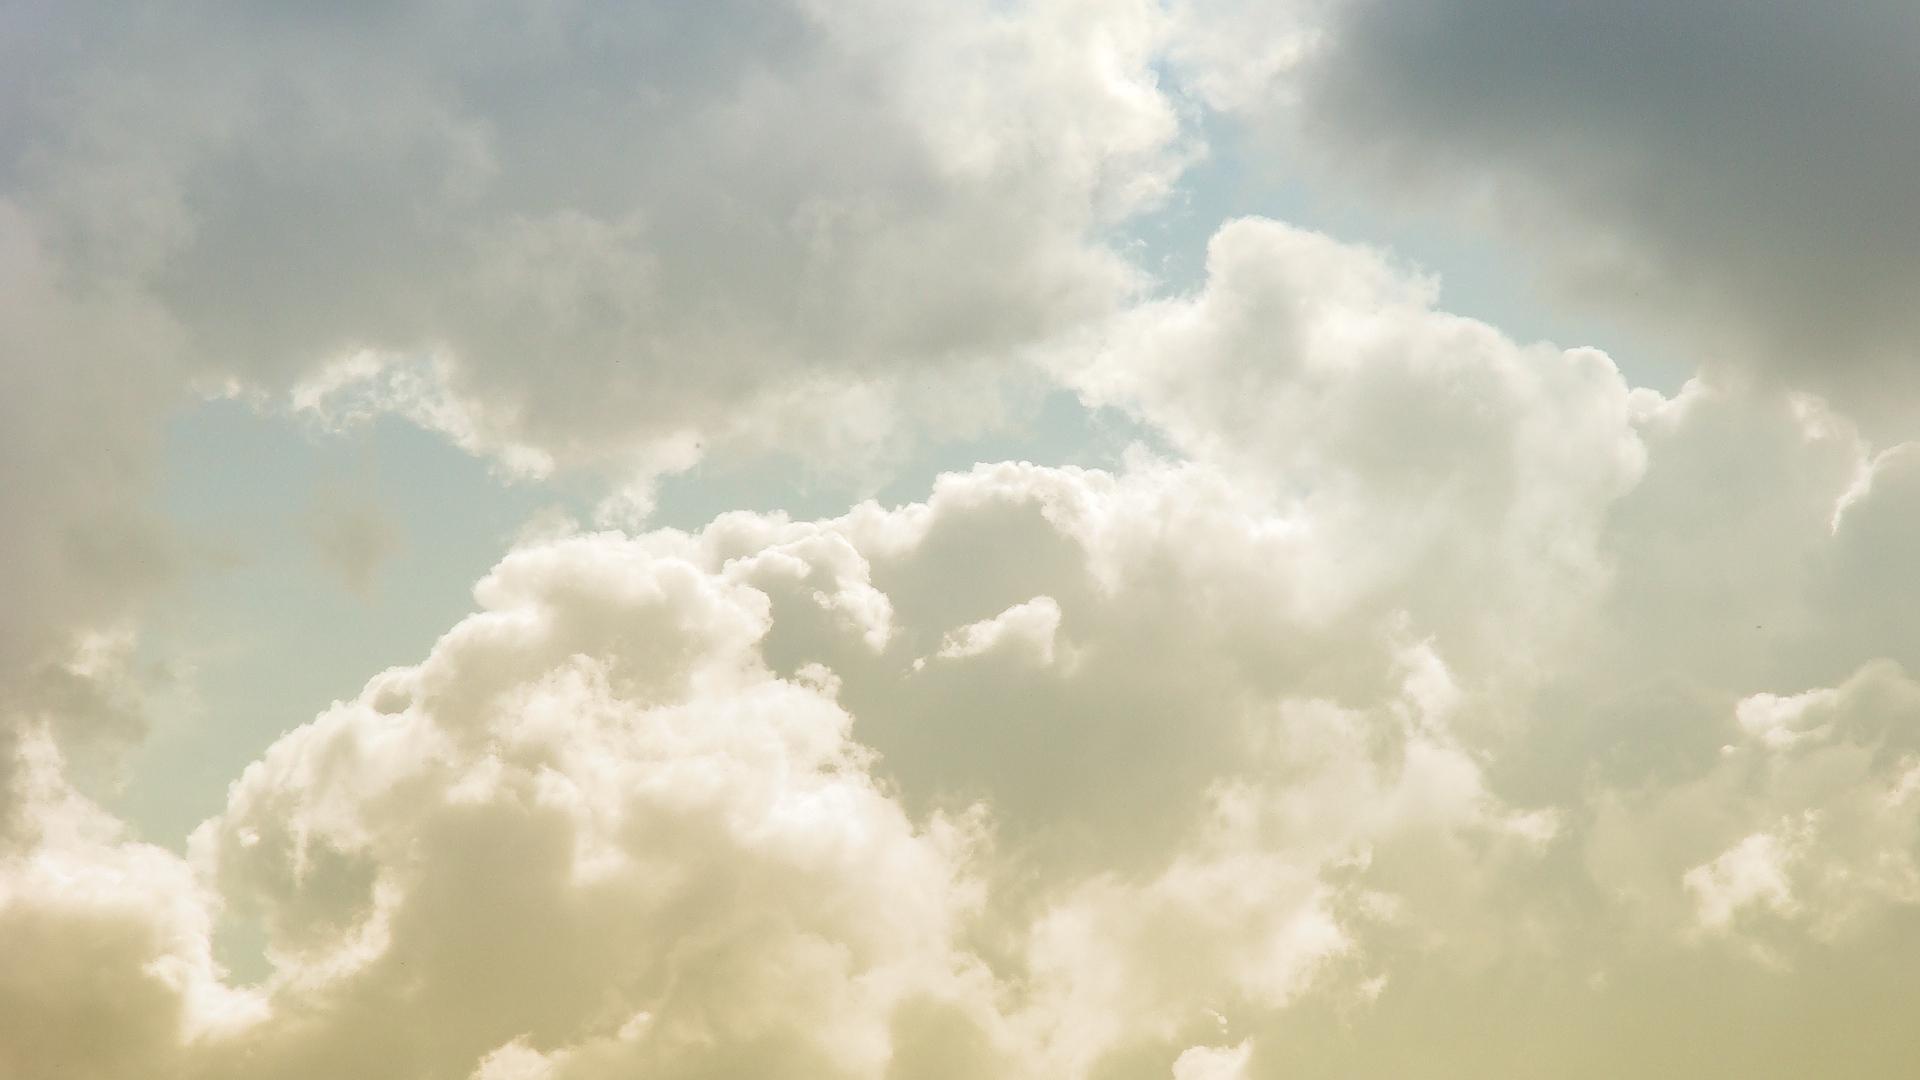 Cloud background hd desktop wallpapers 4k hd for Cloud wallpaper